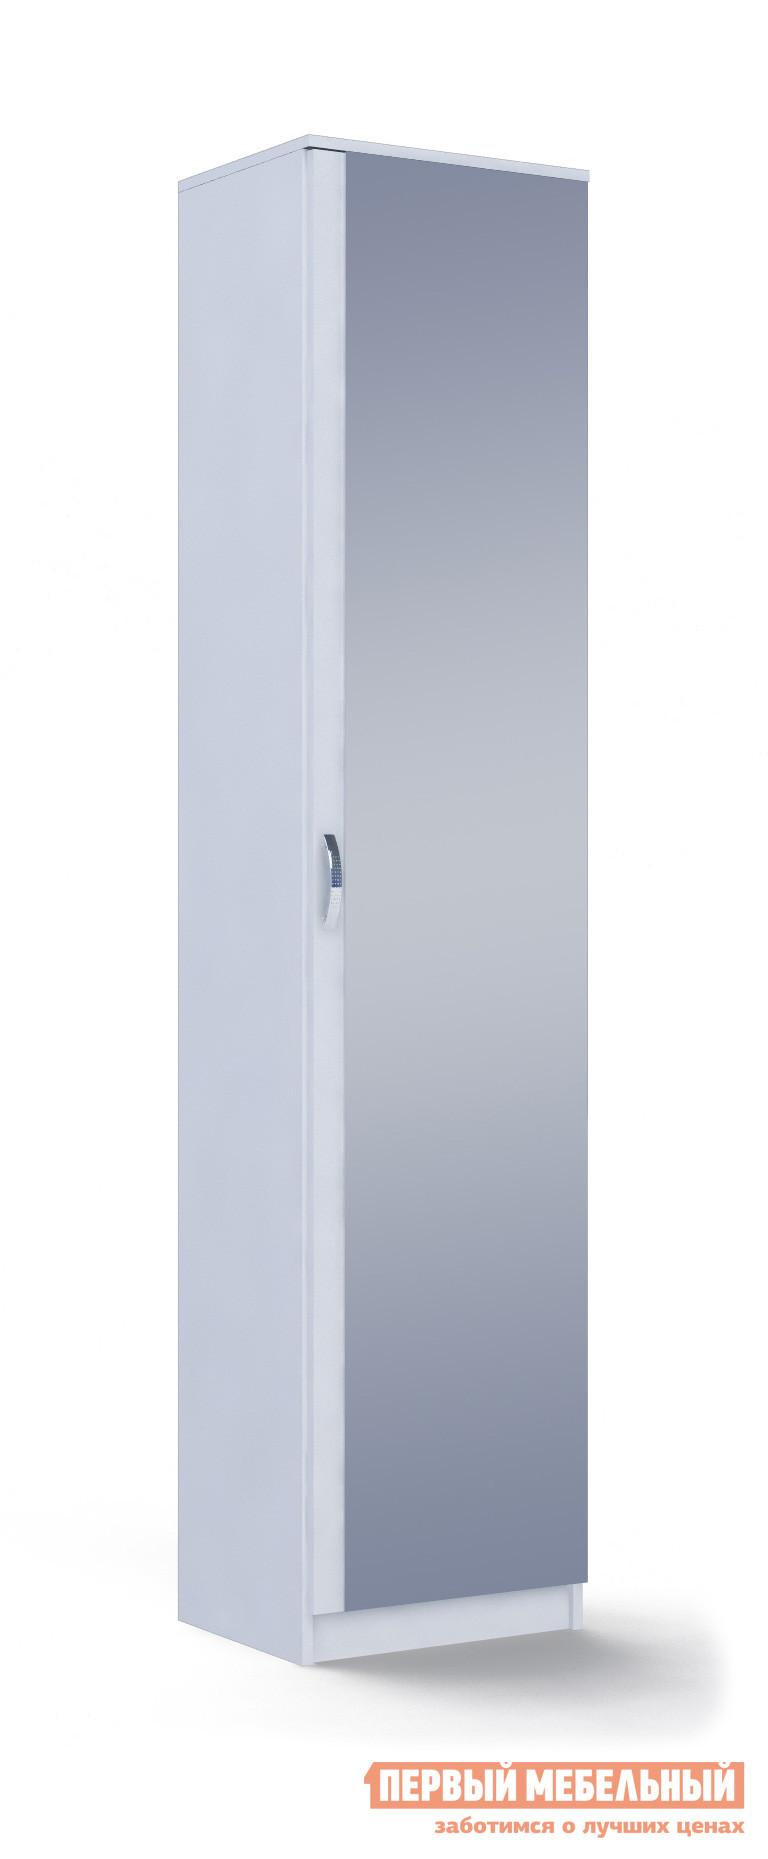 Шкаф распашной МФ Мастер Шкаф 1дверный с зеркалом (Ш1З)